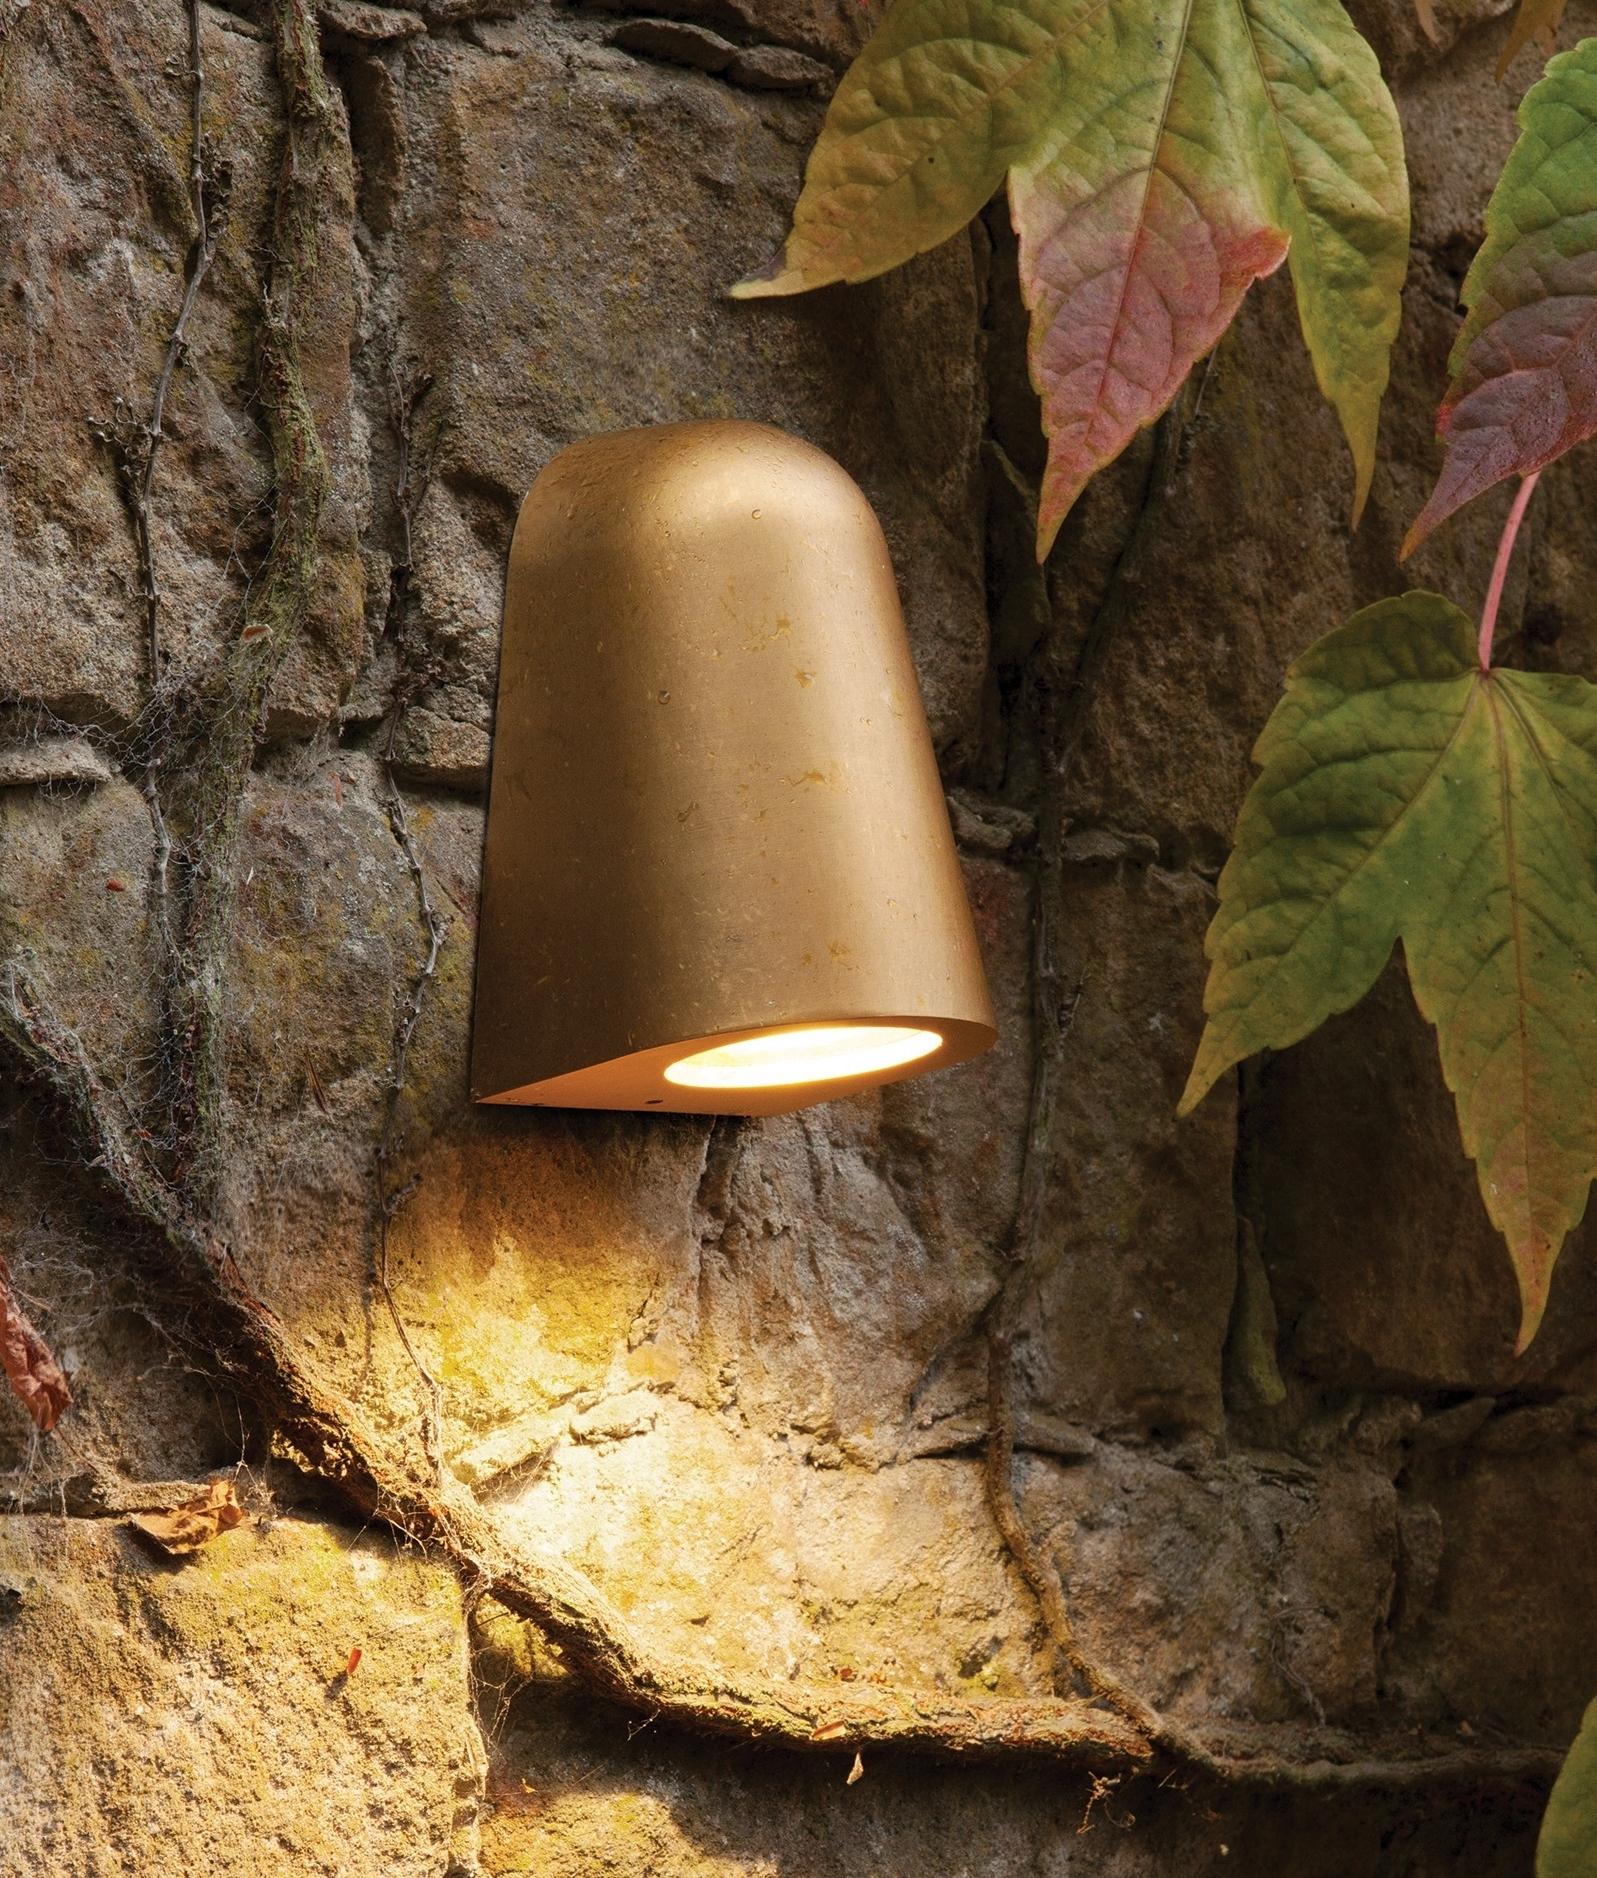 Outdoor Mast Downlight Ip65 Rated